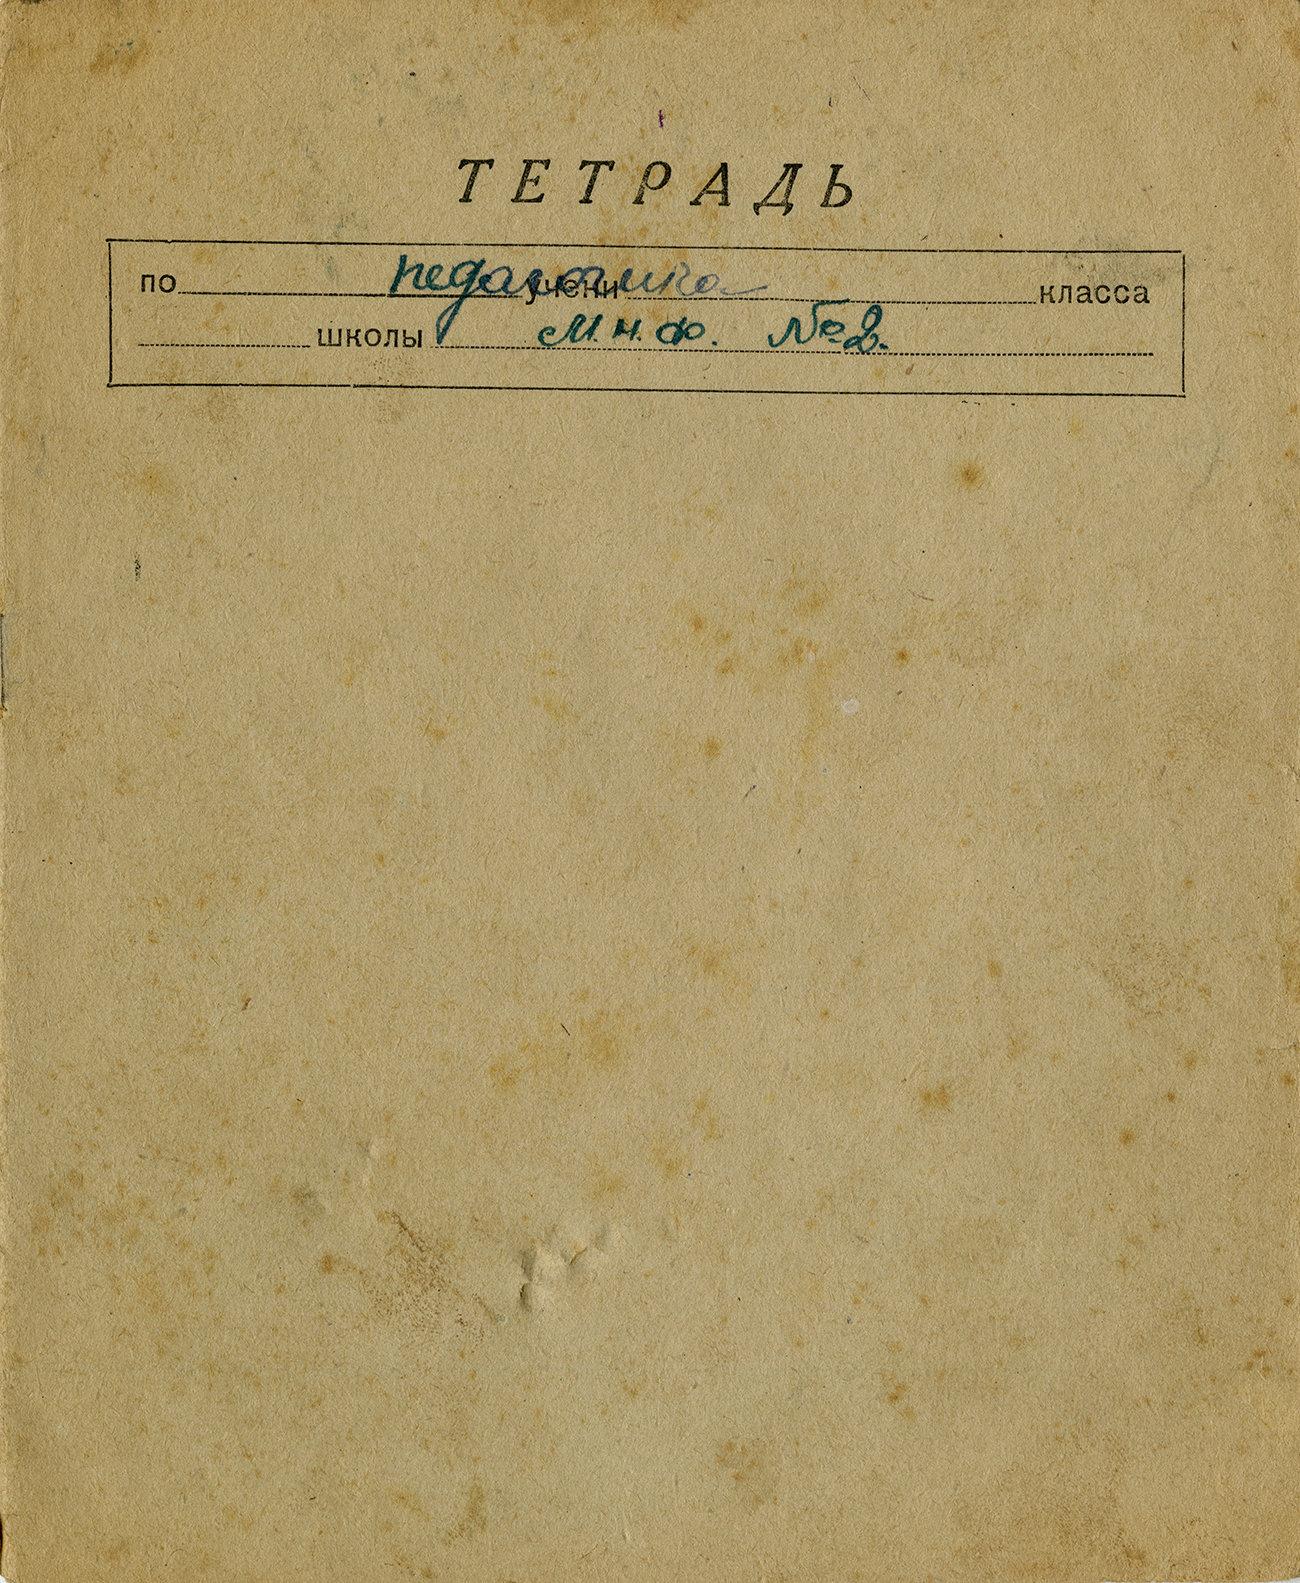 Тетрадь 1944, 170х205